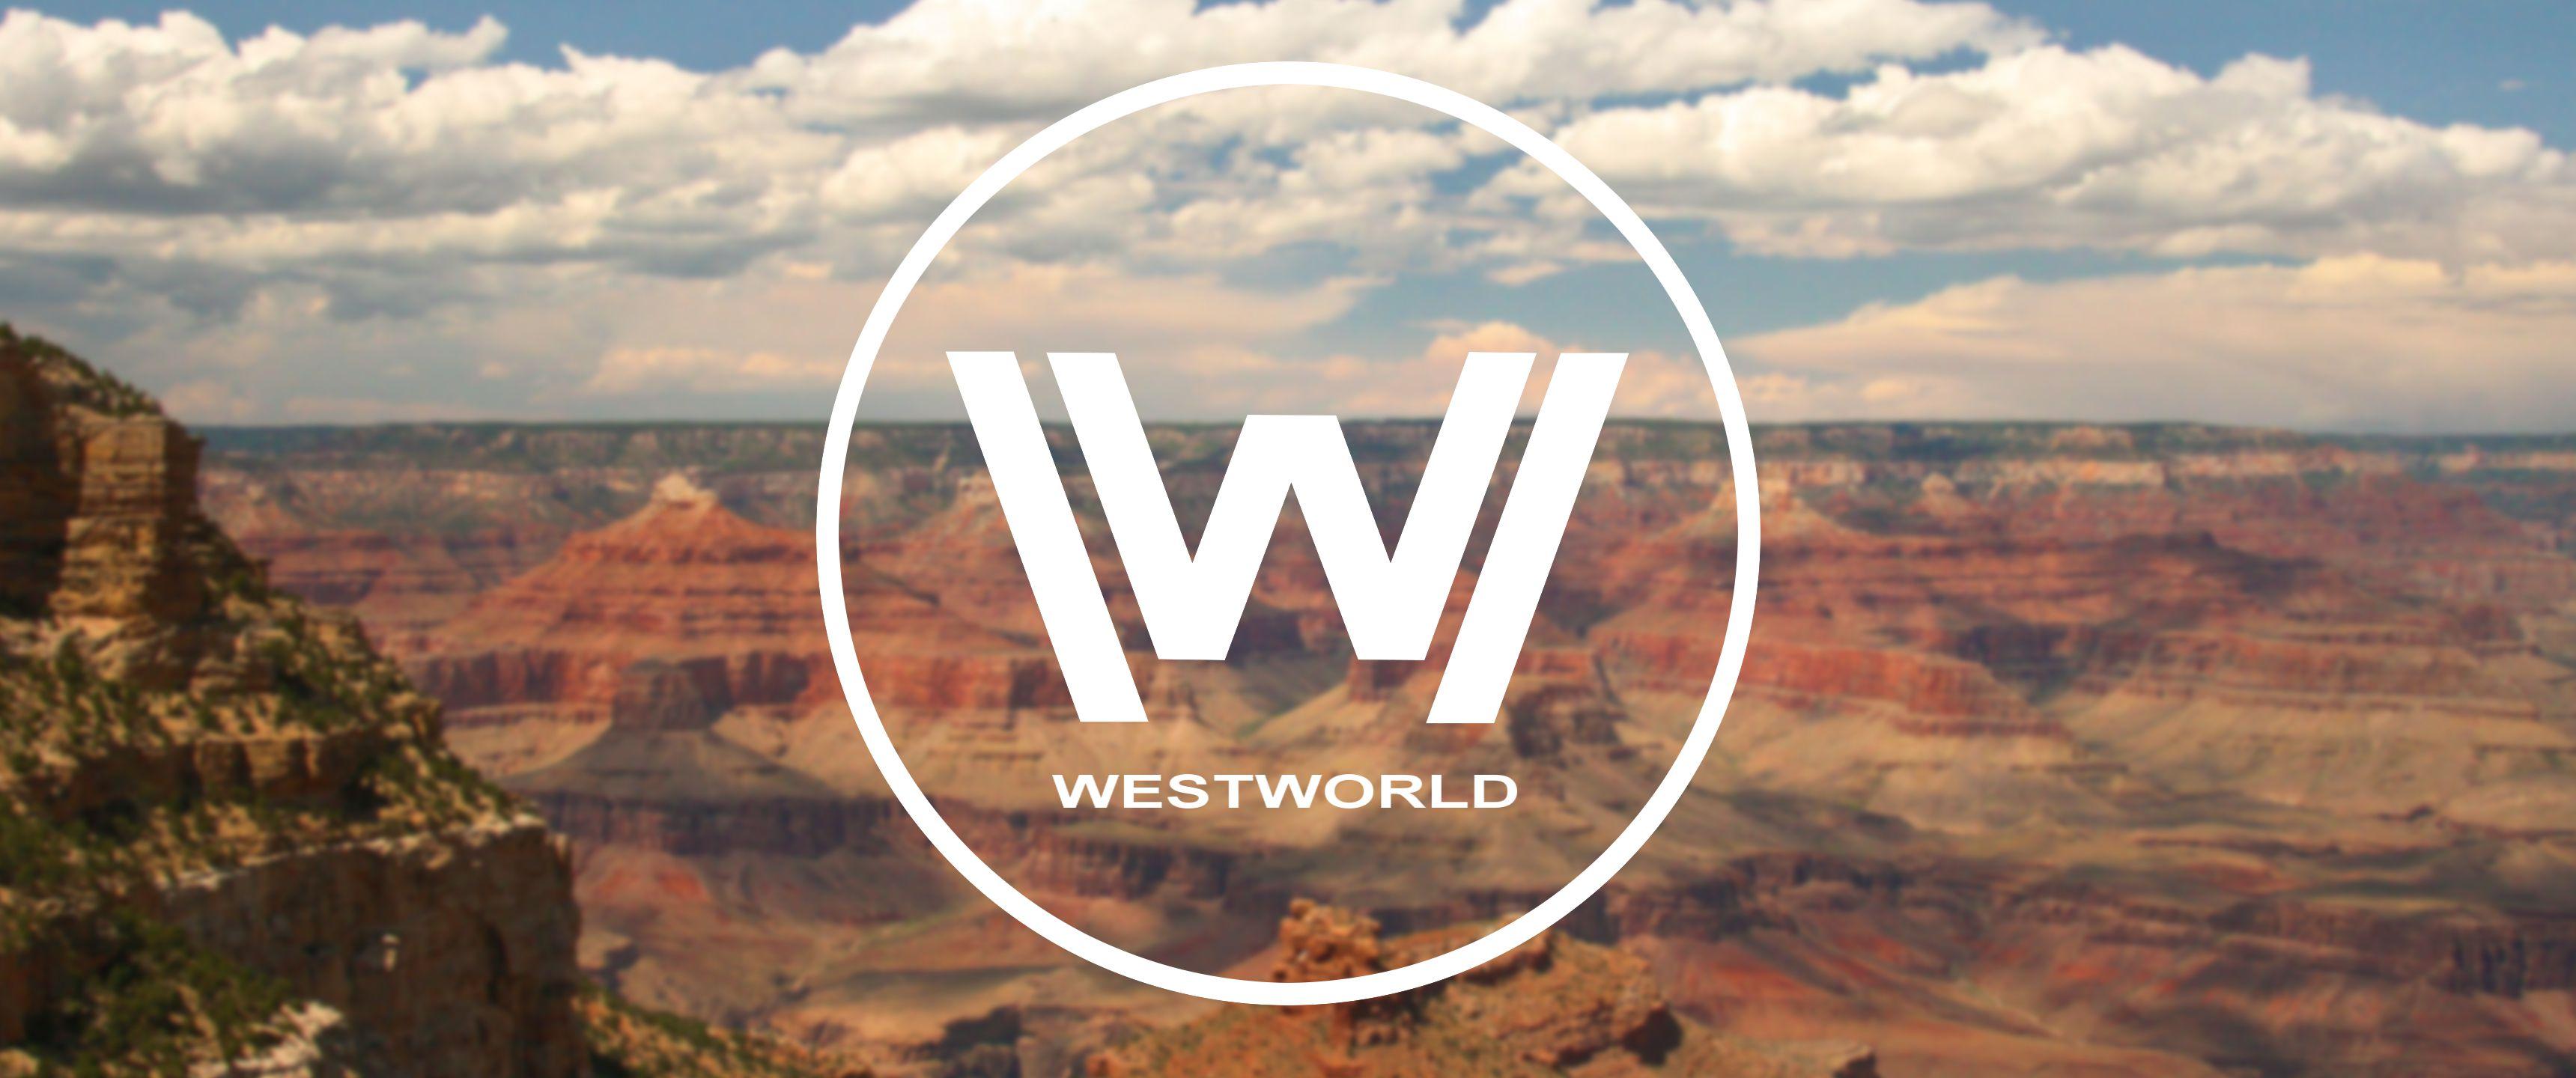 Westworld Prime